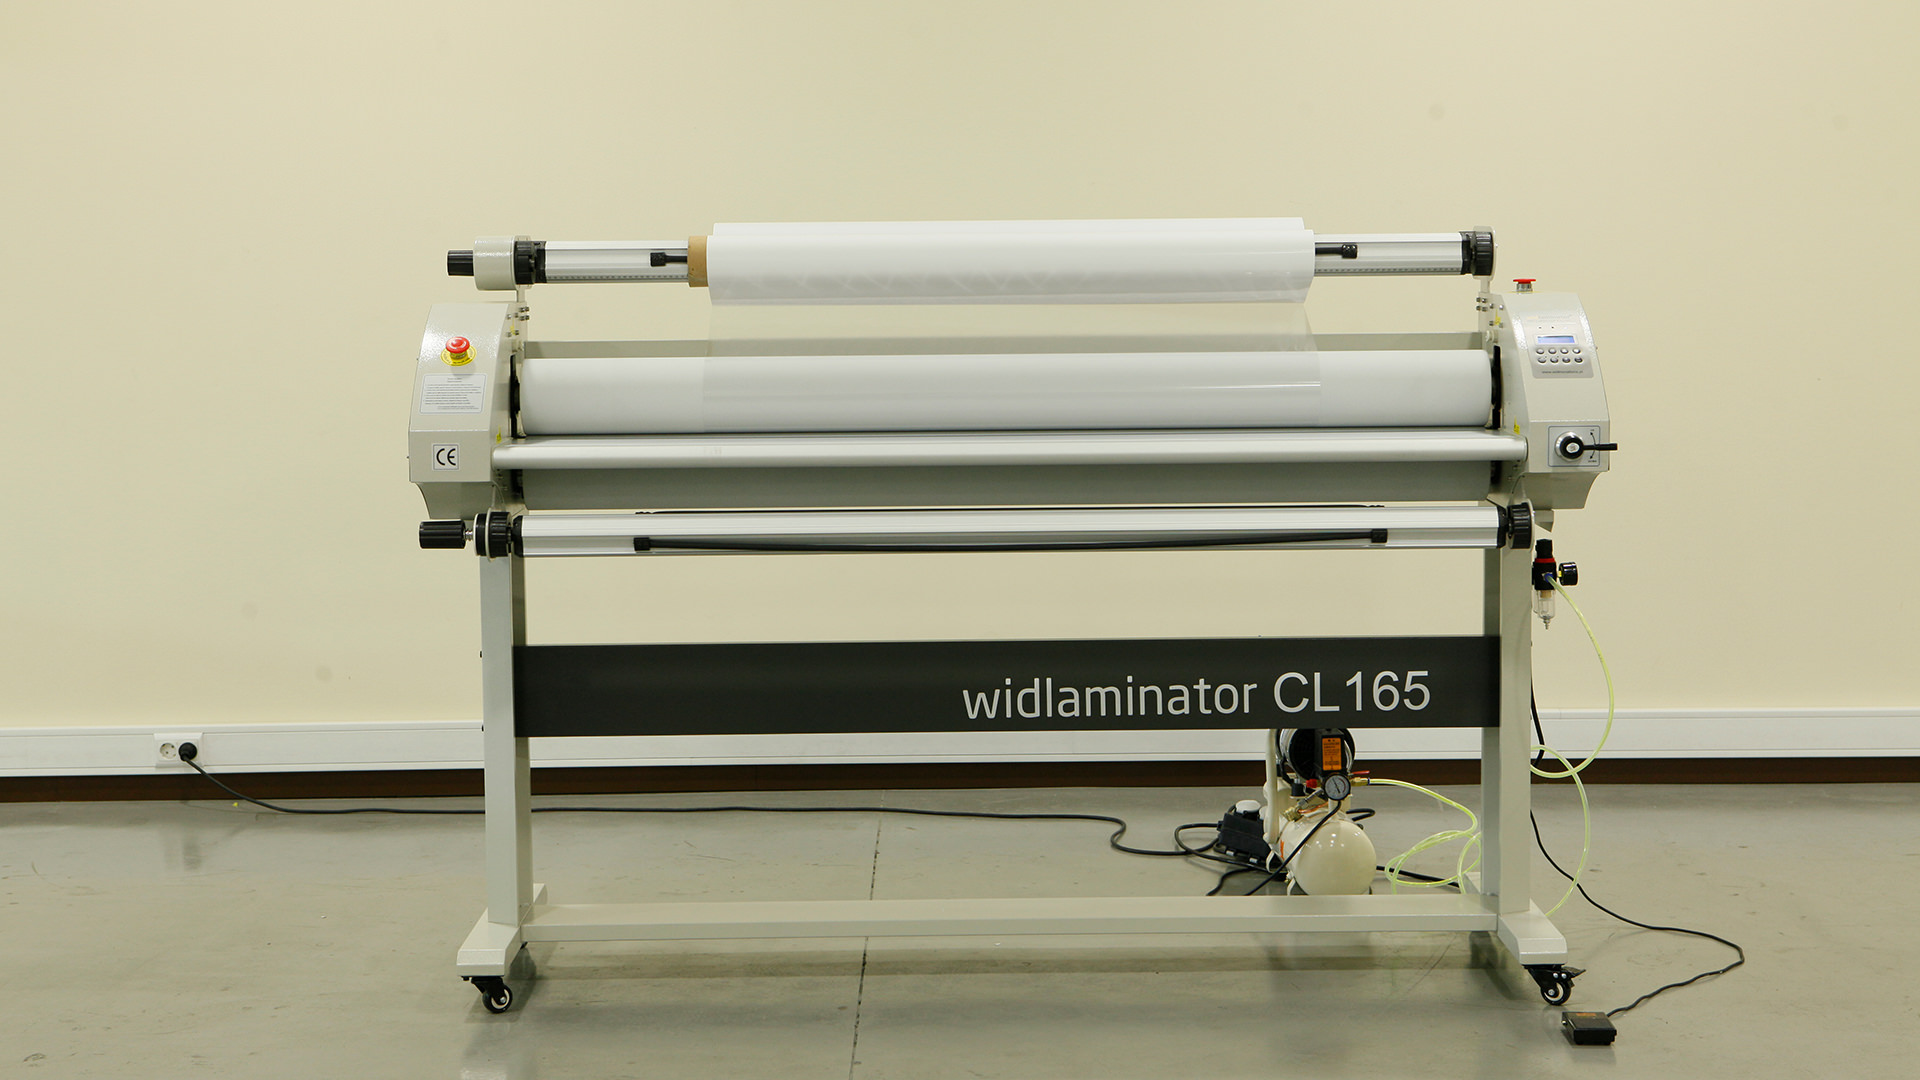 widlaminator cl165